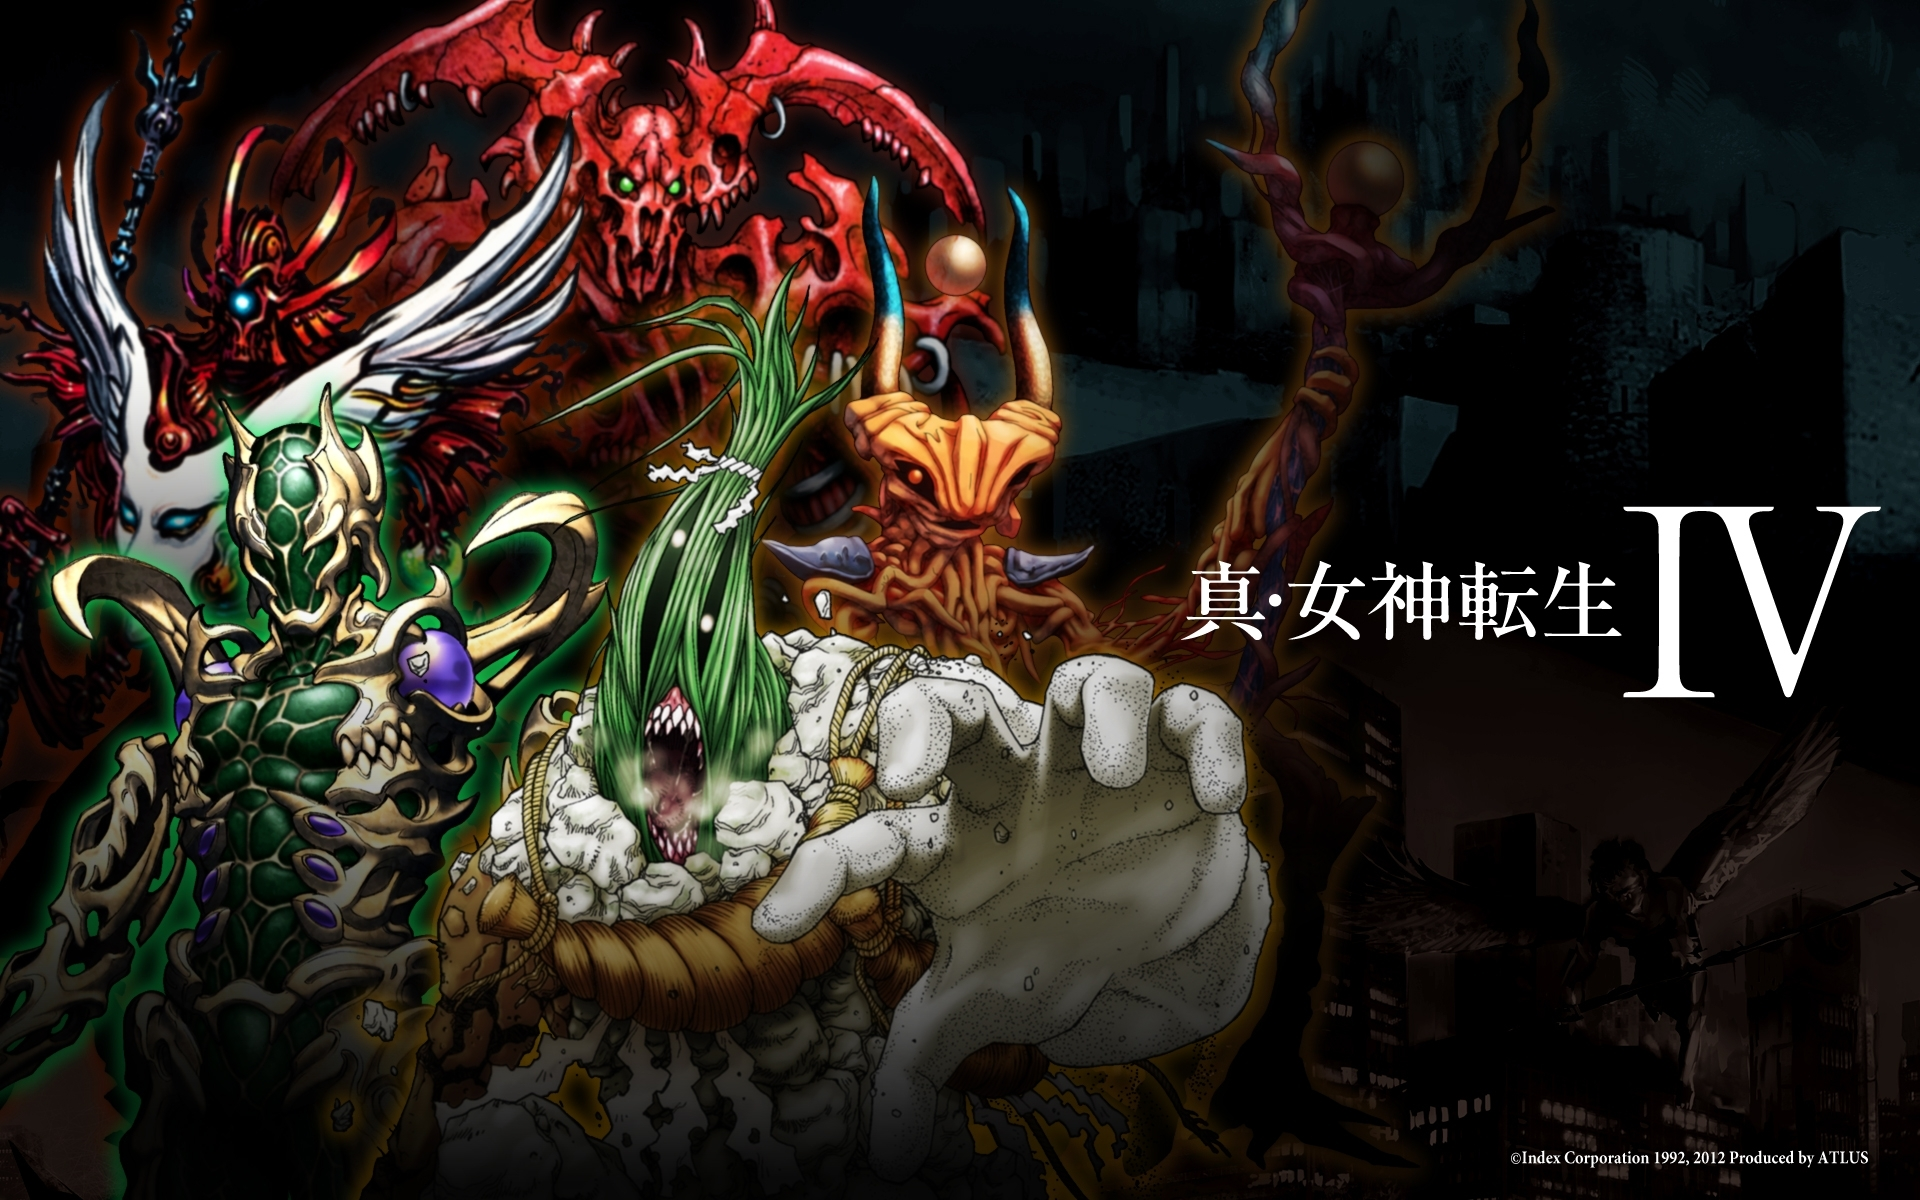 shin megami tensei iv images shin megami tensei iv wallpaper 02